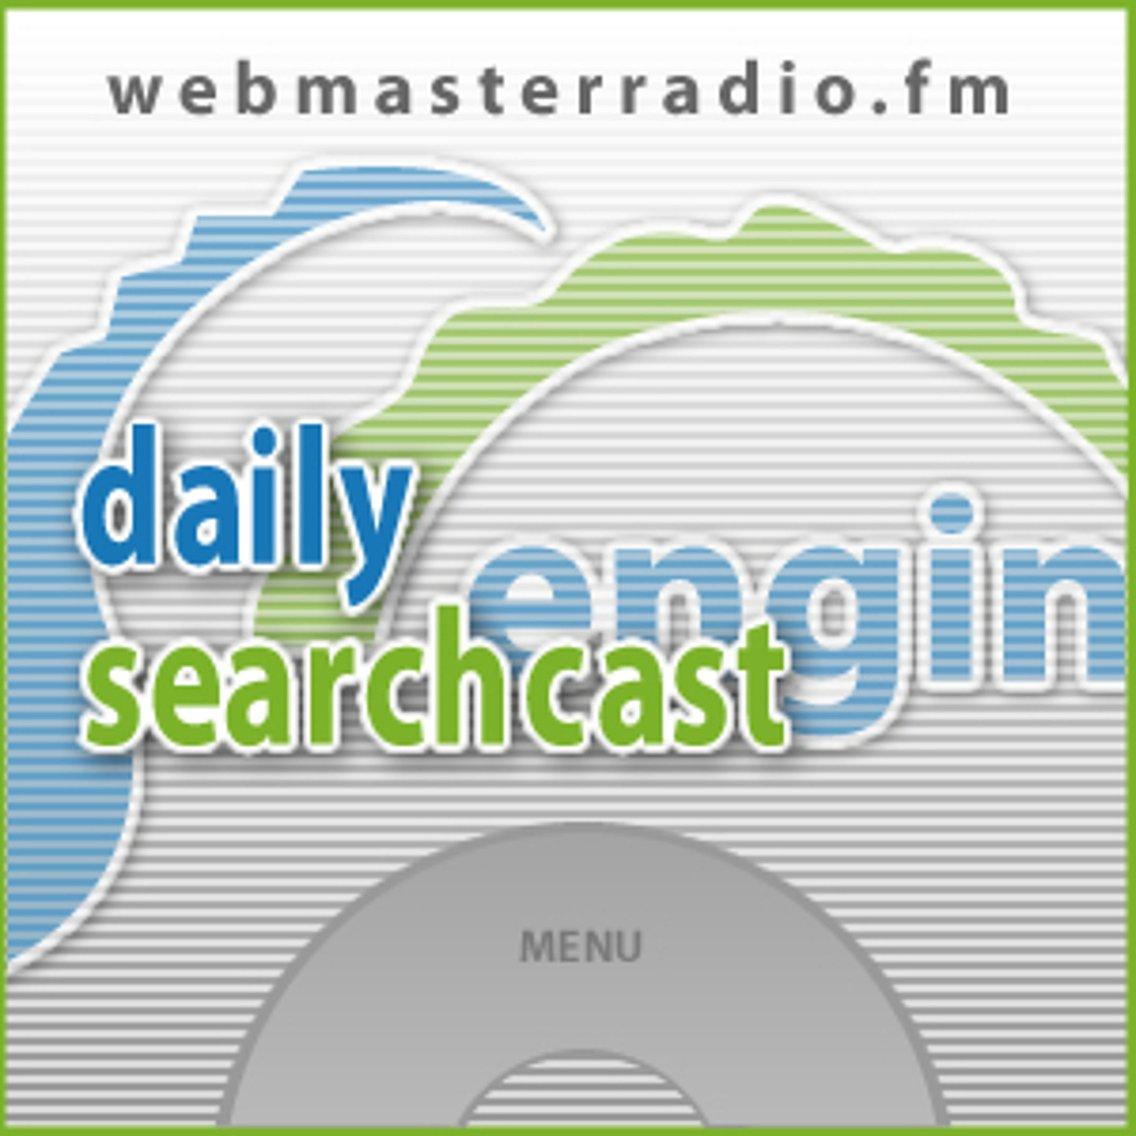 The Daily Searchast with Danny Sullivan - imagen de portada